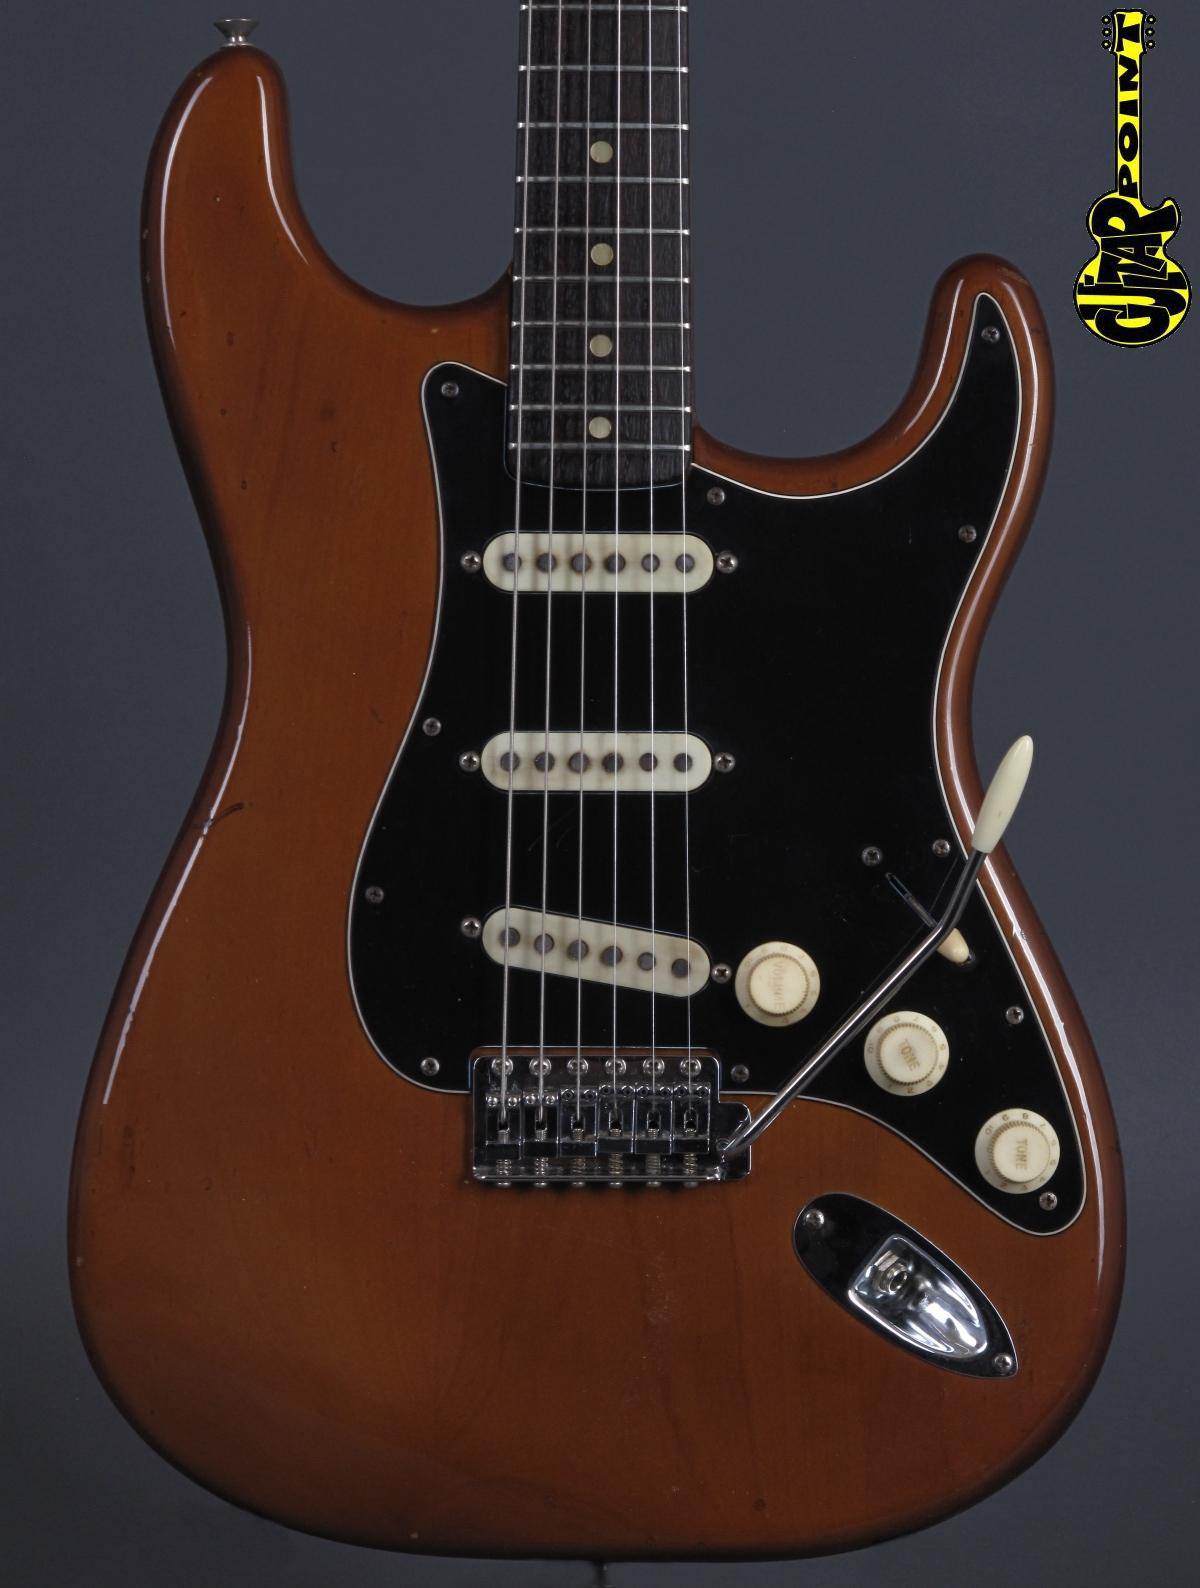 1974 Fender Stratocaster - Mocha / Rosewood Neck